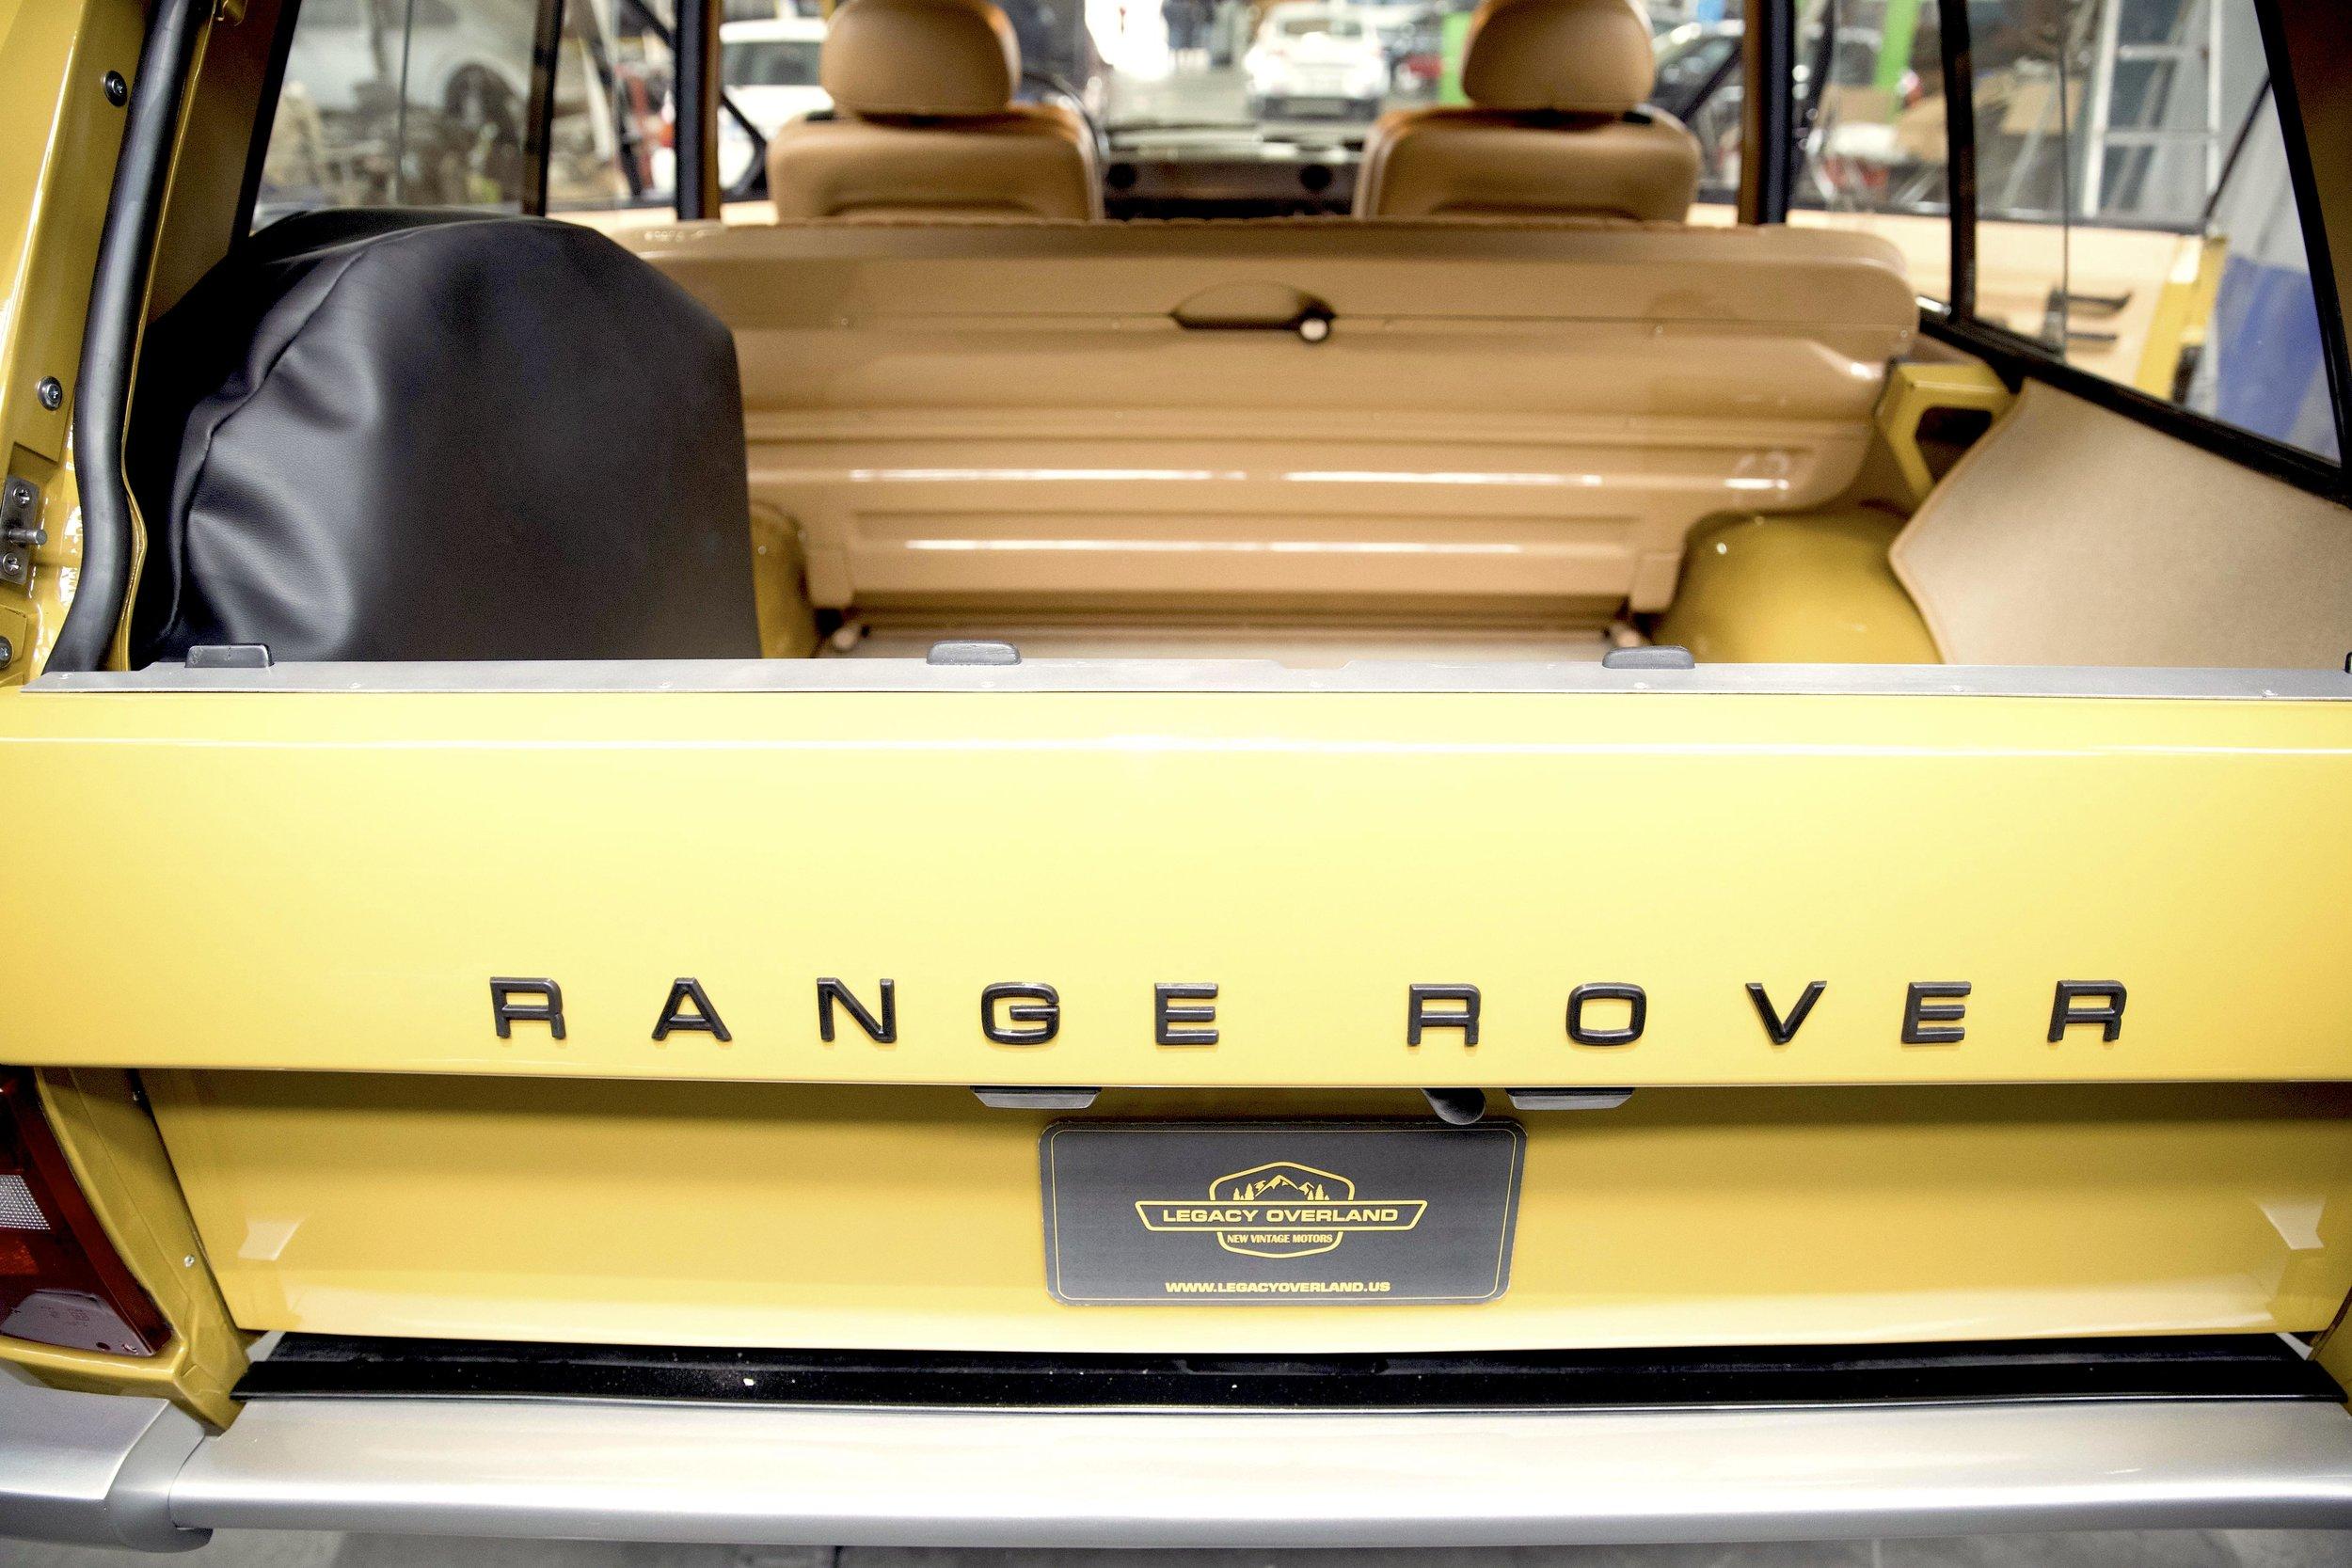 LegacyOverland_1973_RangeRover_shop33.jpg